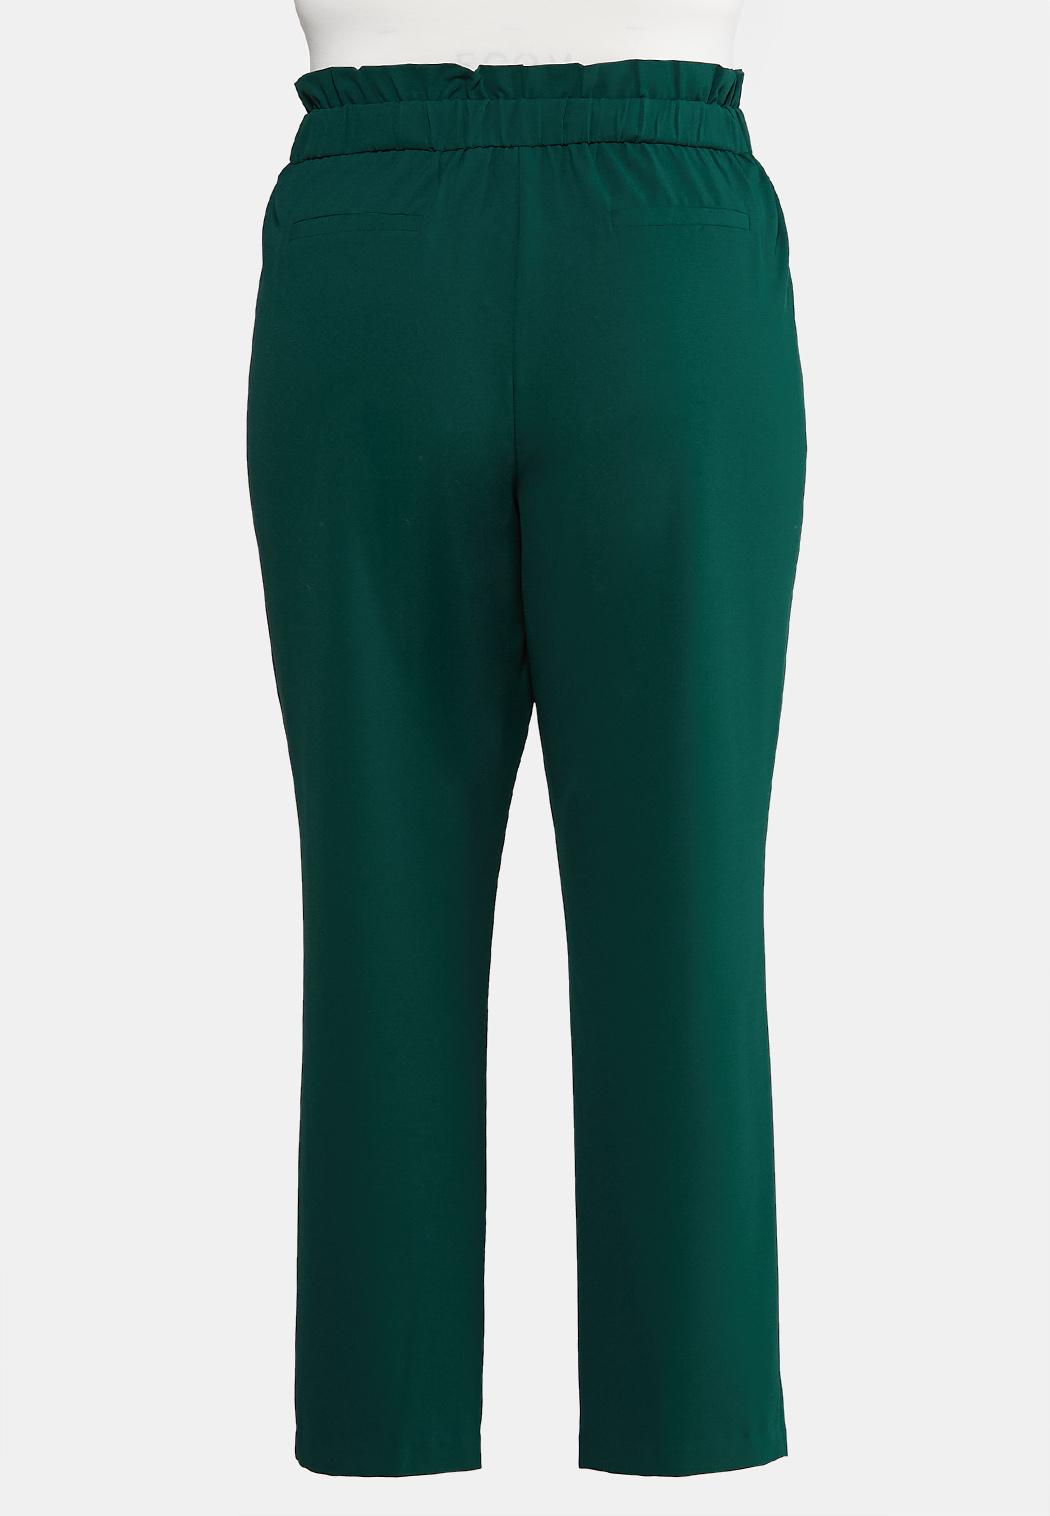 Plus Size Solid Paperbag Pants (Item #44009001)